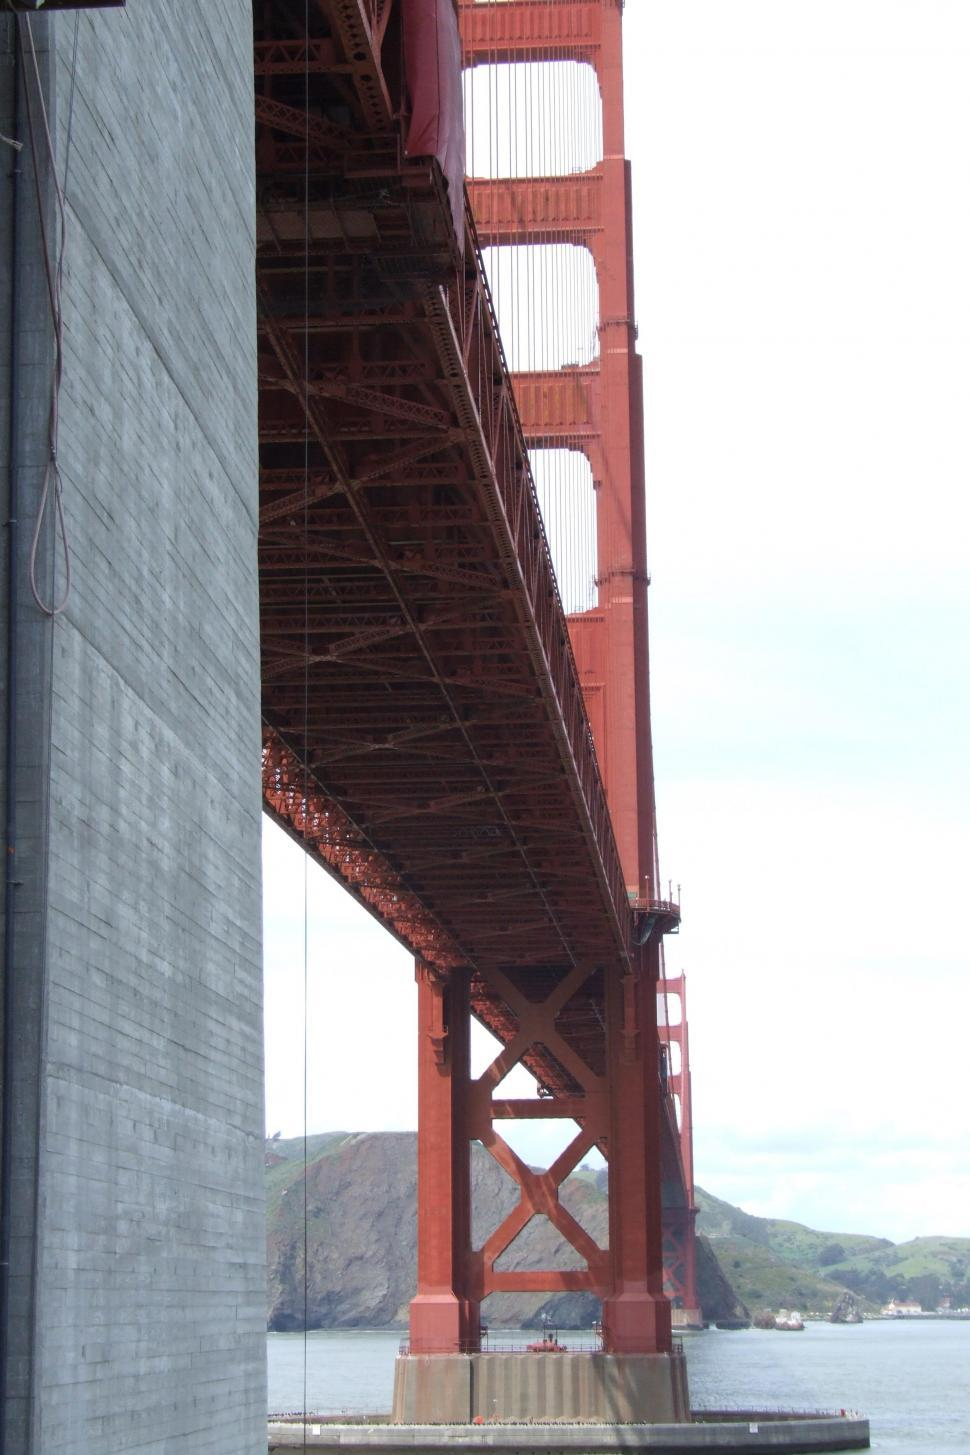 Download Free Stock Photo of Golden Gate Bridge